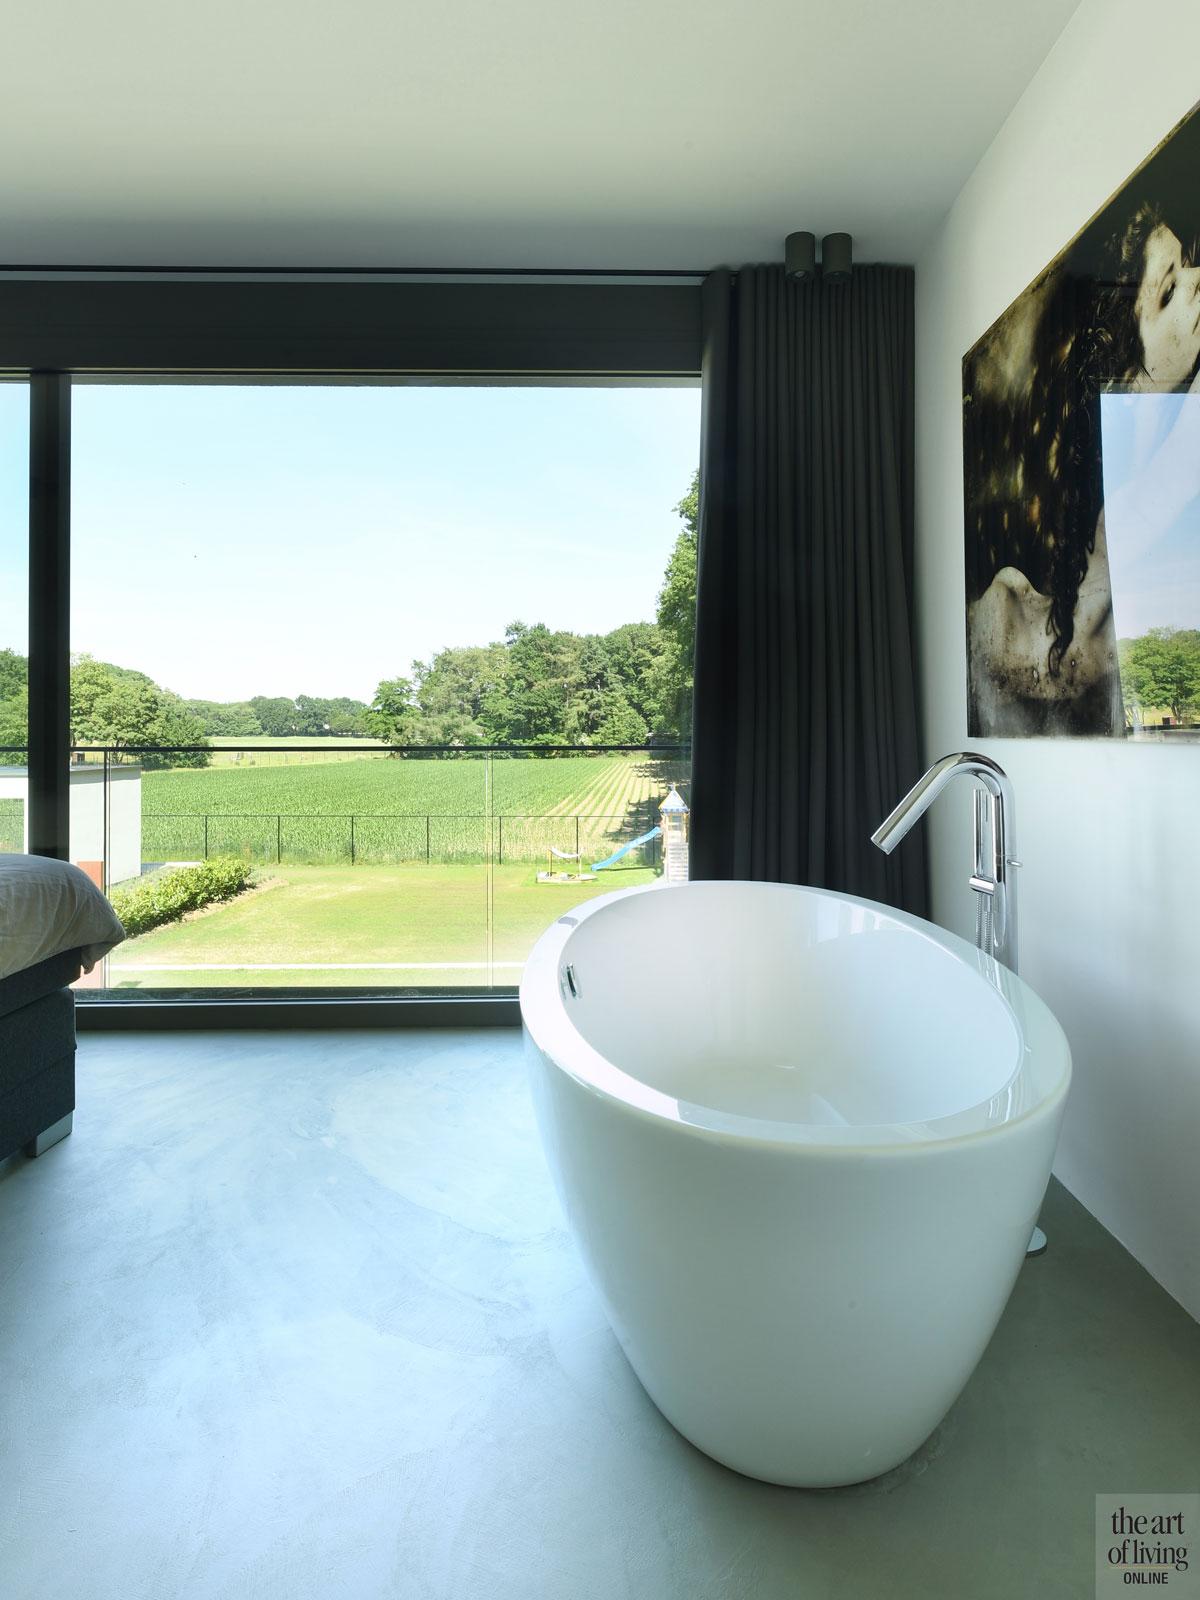 strak interieur, the art of living, dreessen willemsen